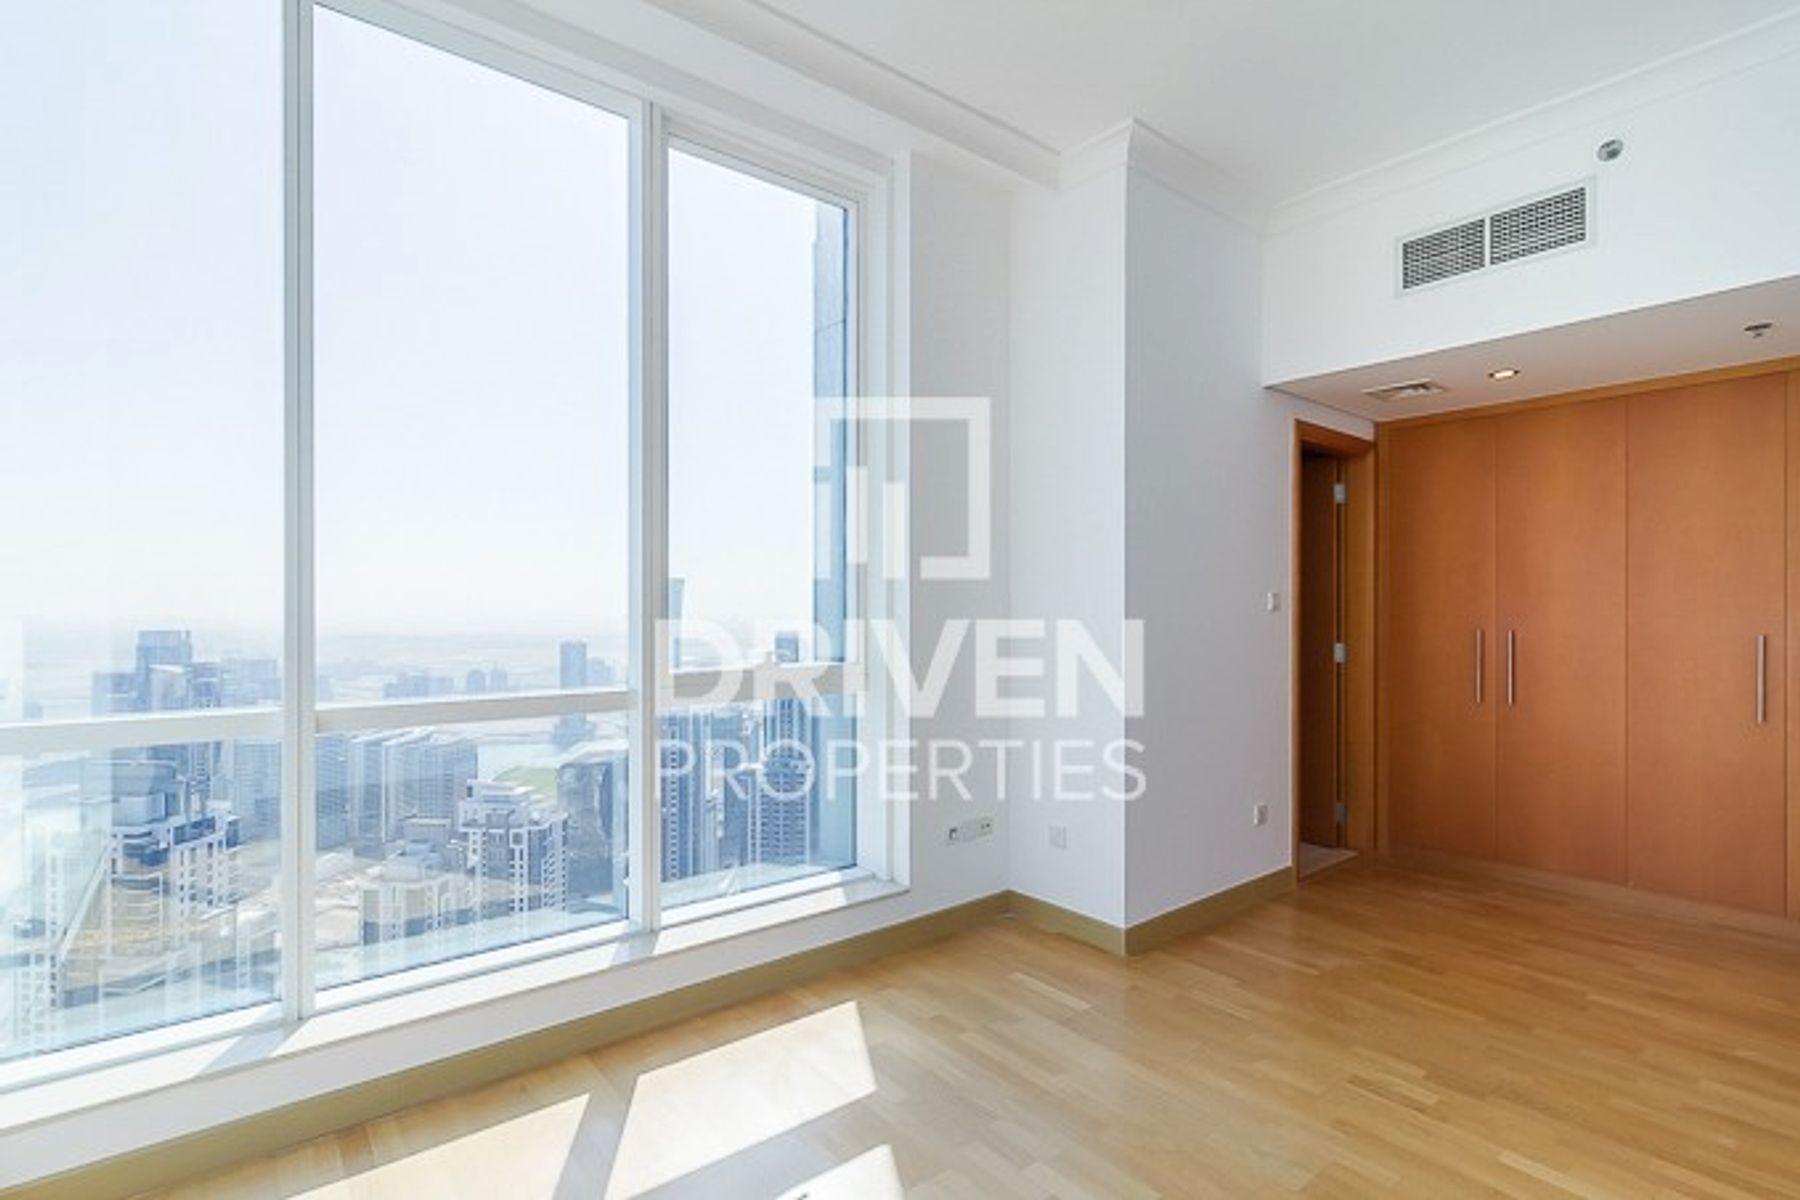 Apartment for Rent in Manazel Al Safa, Business Bay